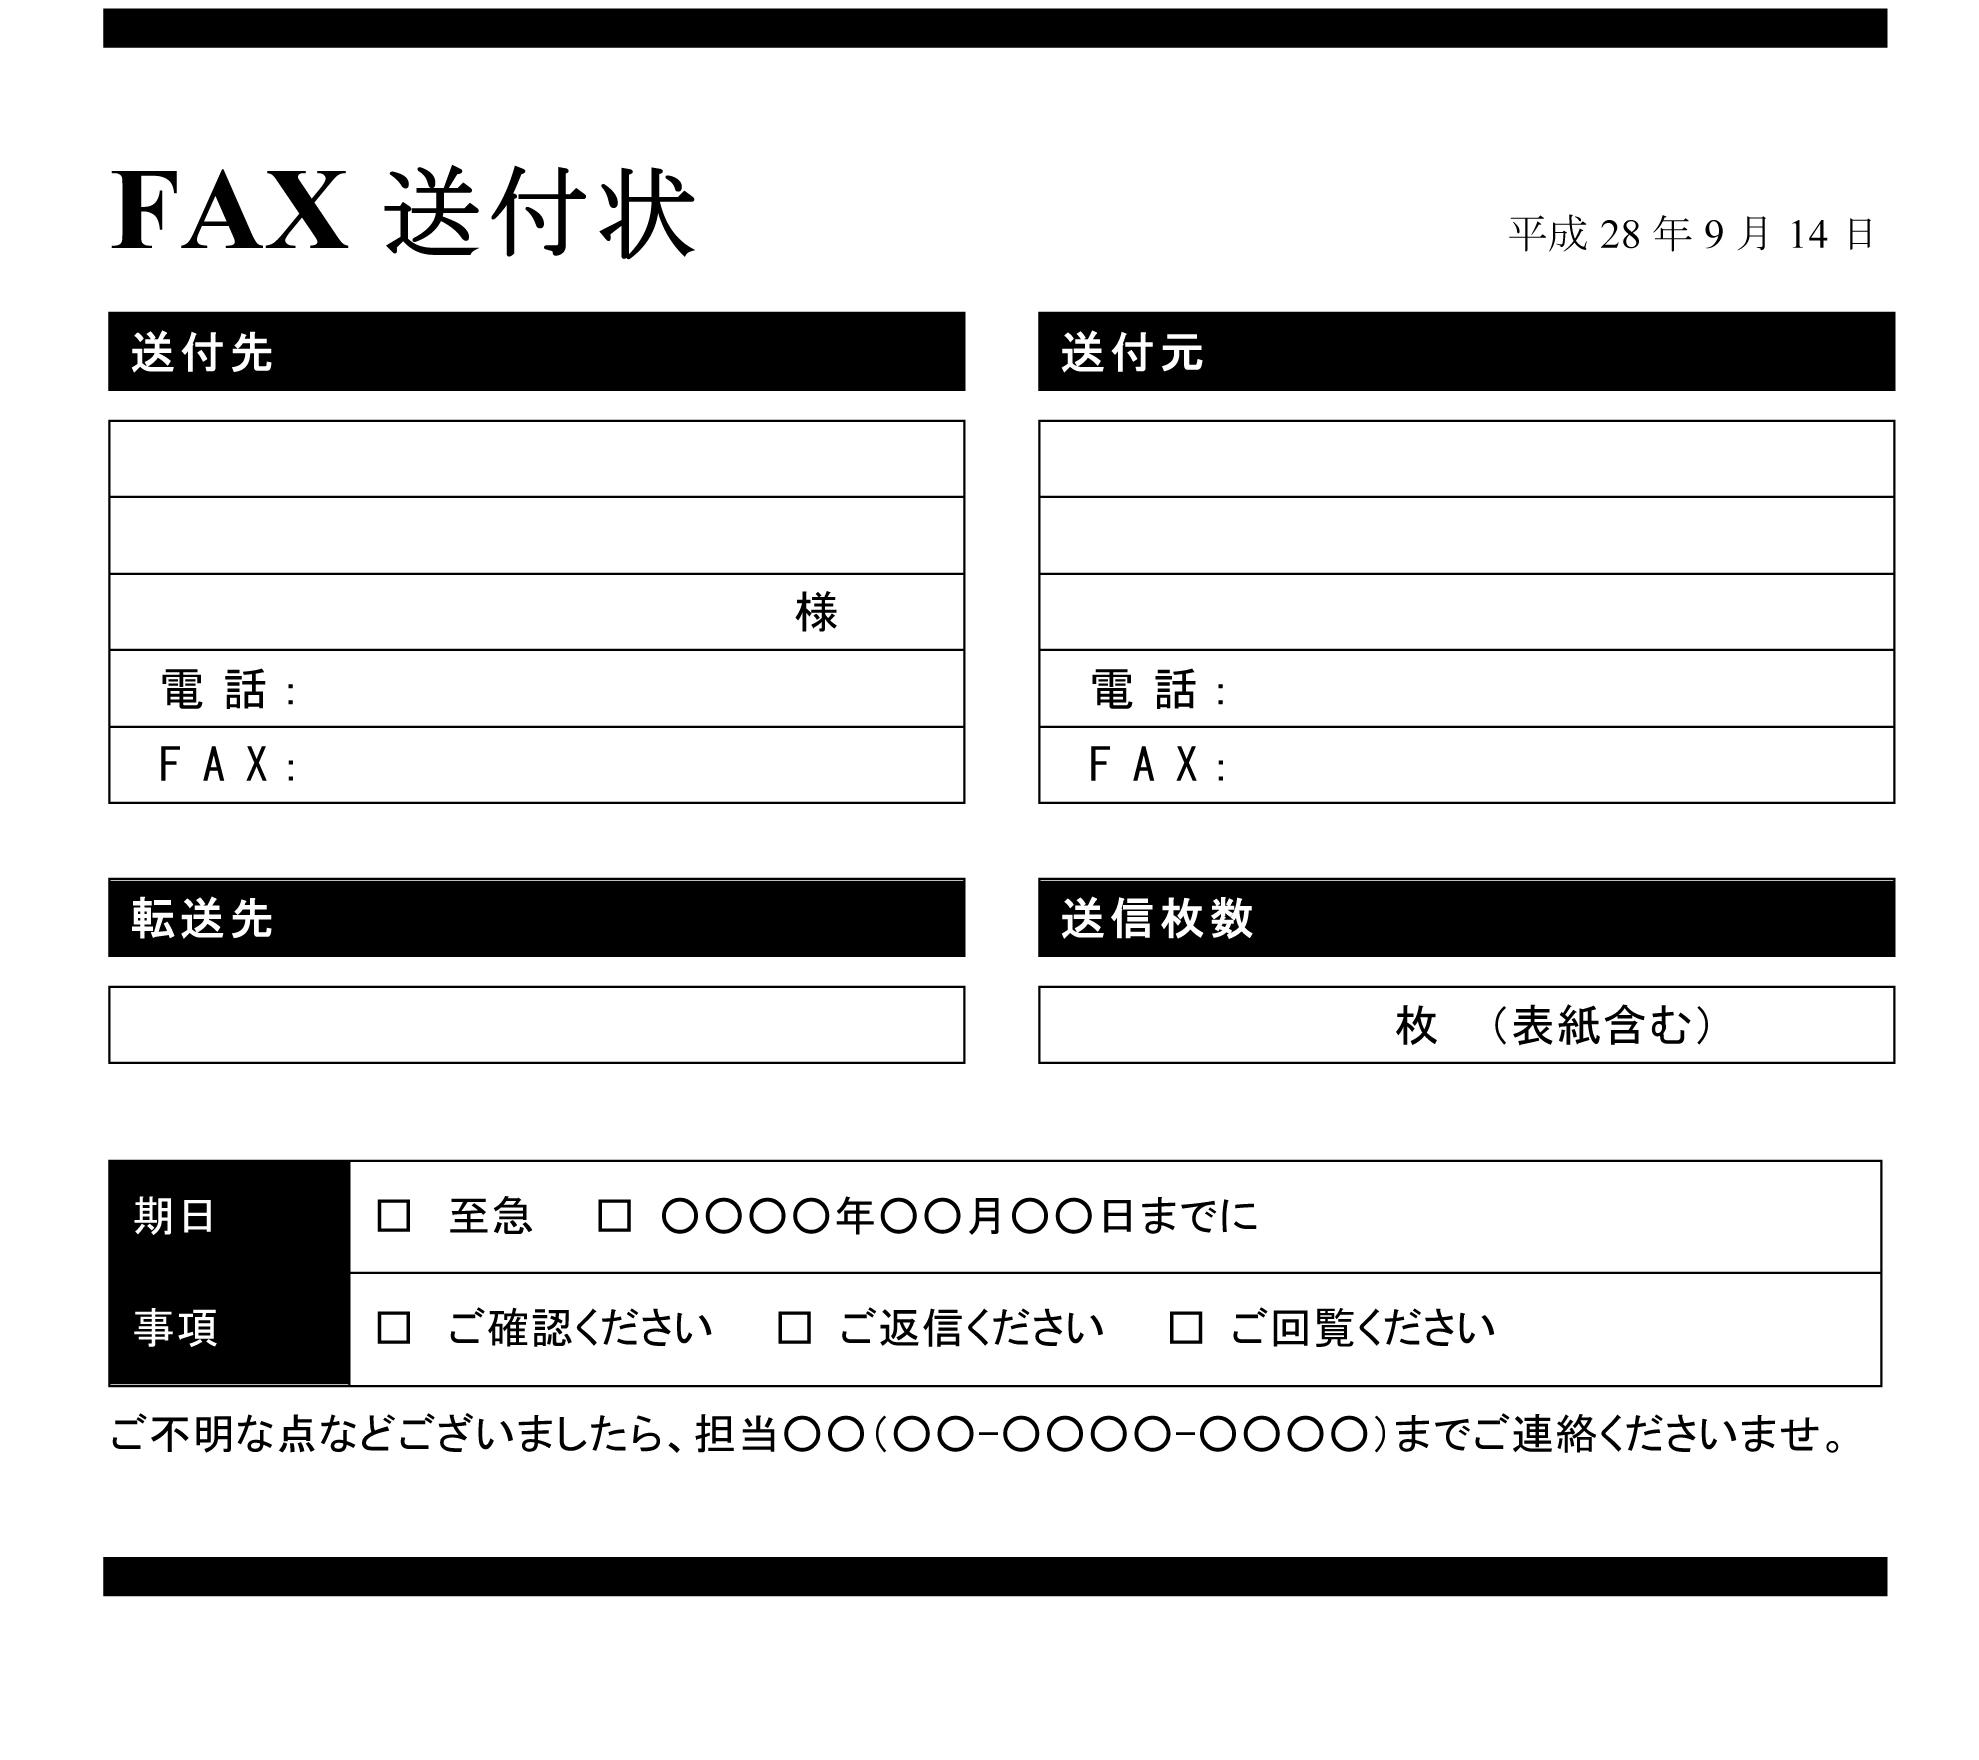 fax送付状6